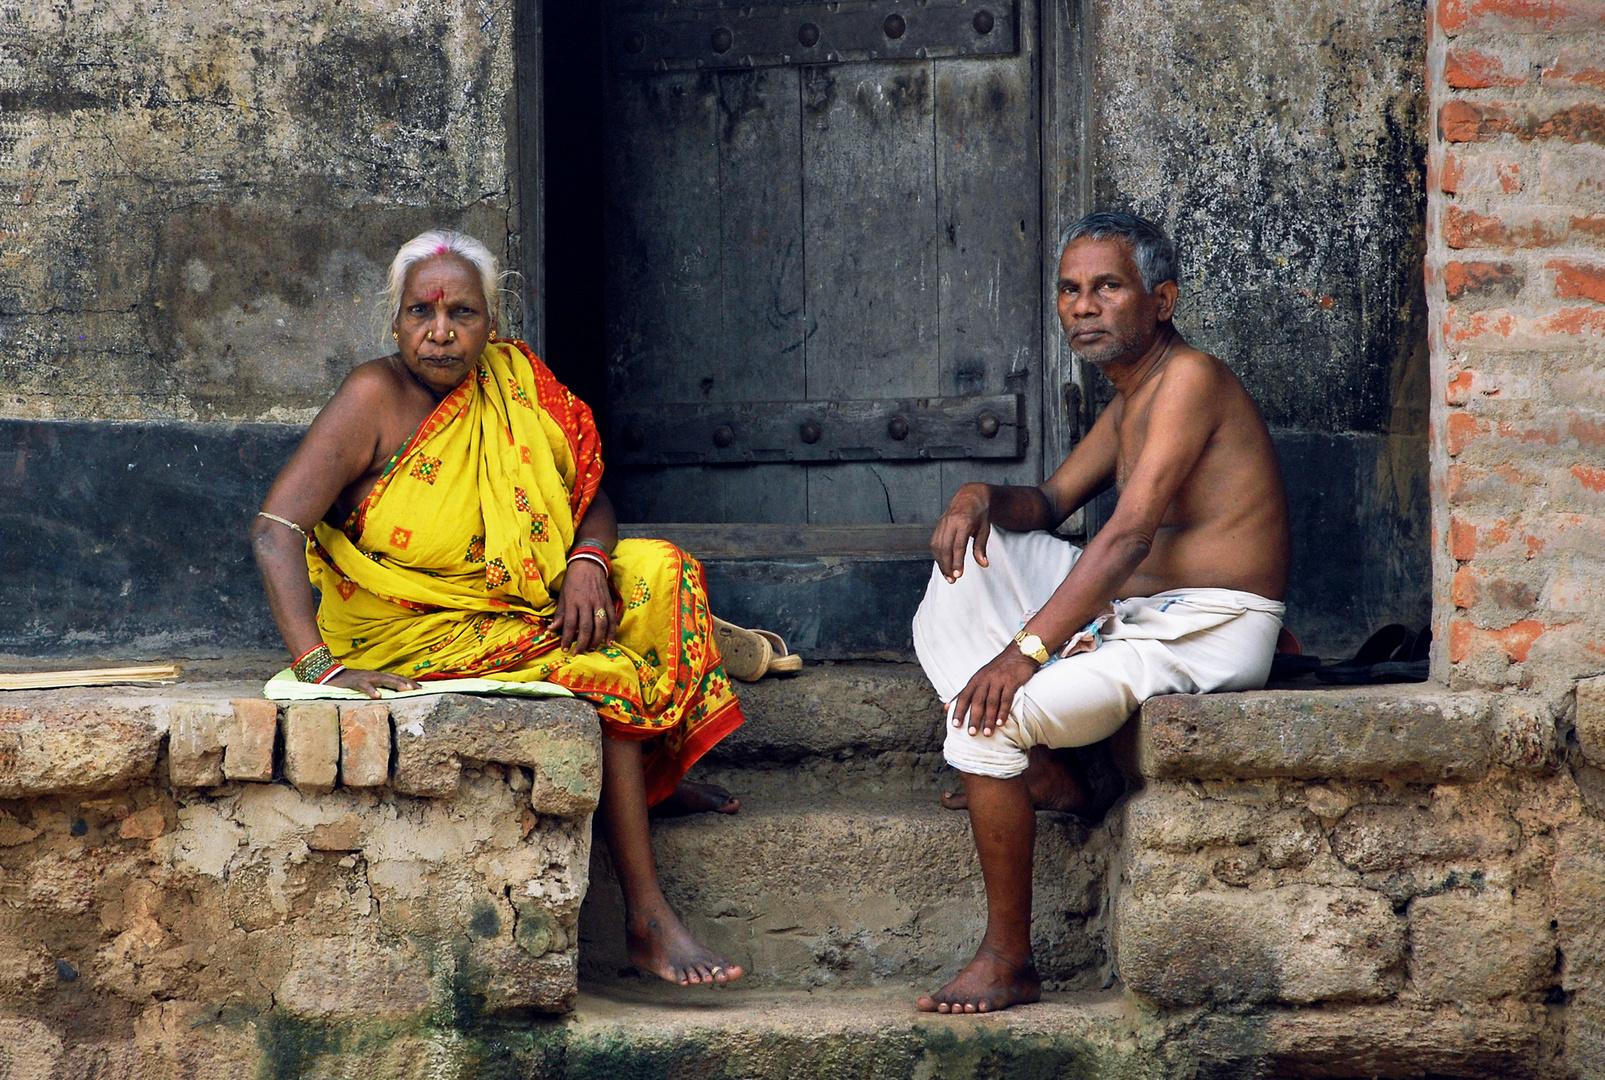 Volti e persone - Raghuraipur - 5 -